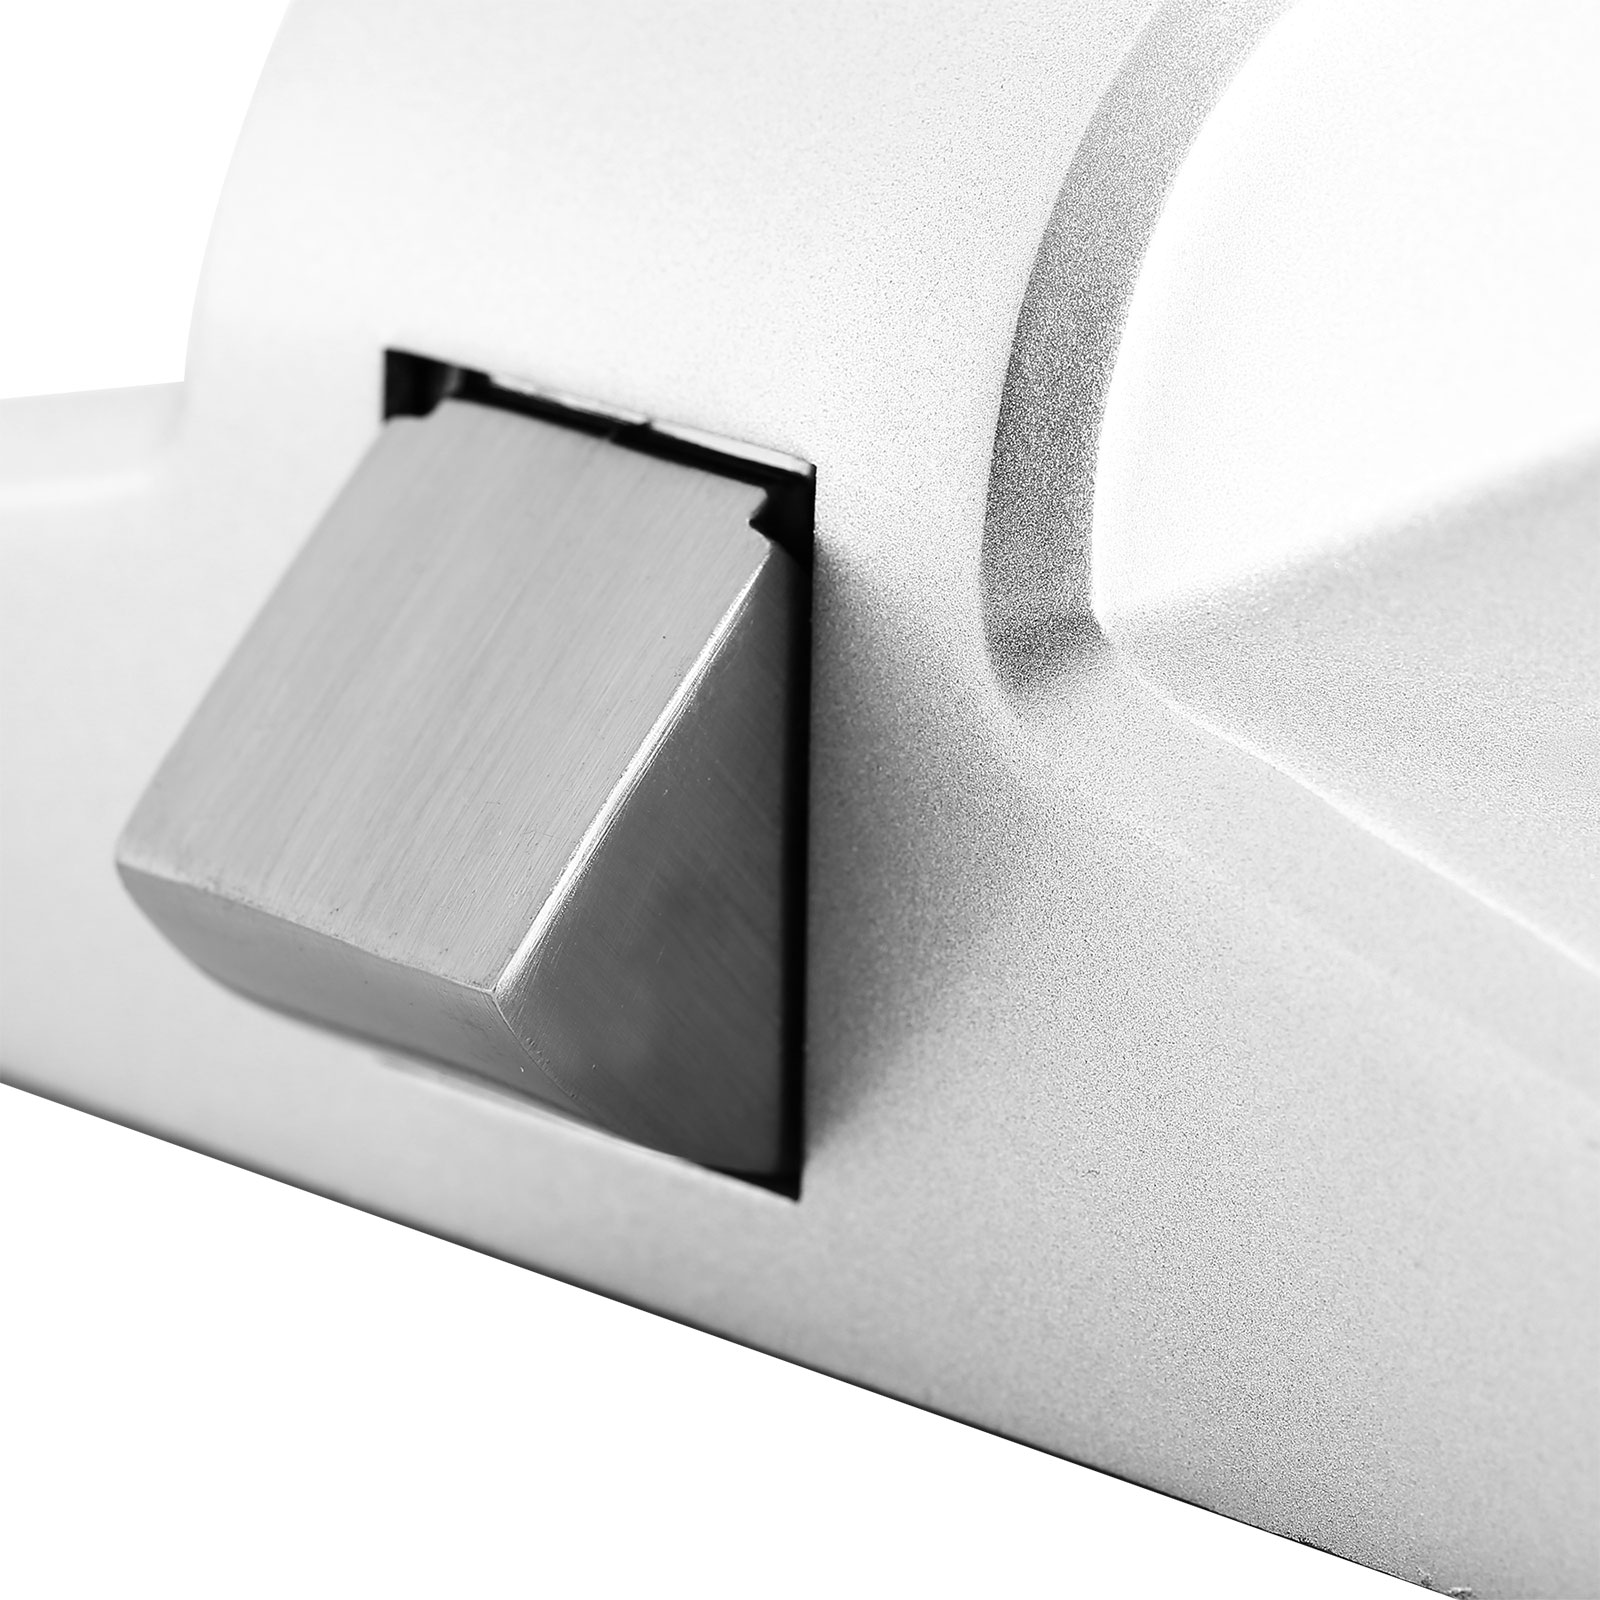 Bar Gate Latch : Door push bar panic exit lock latches emergency hardware